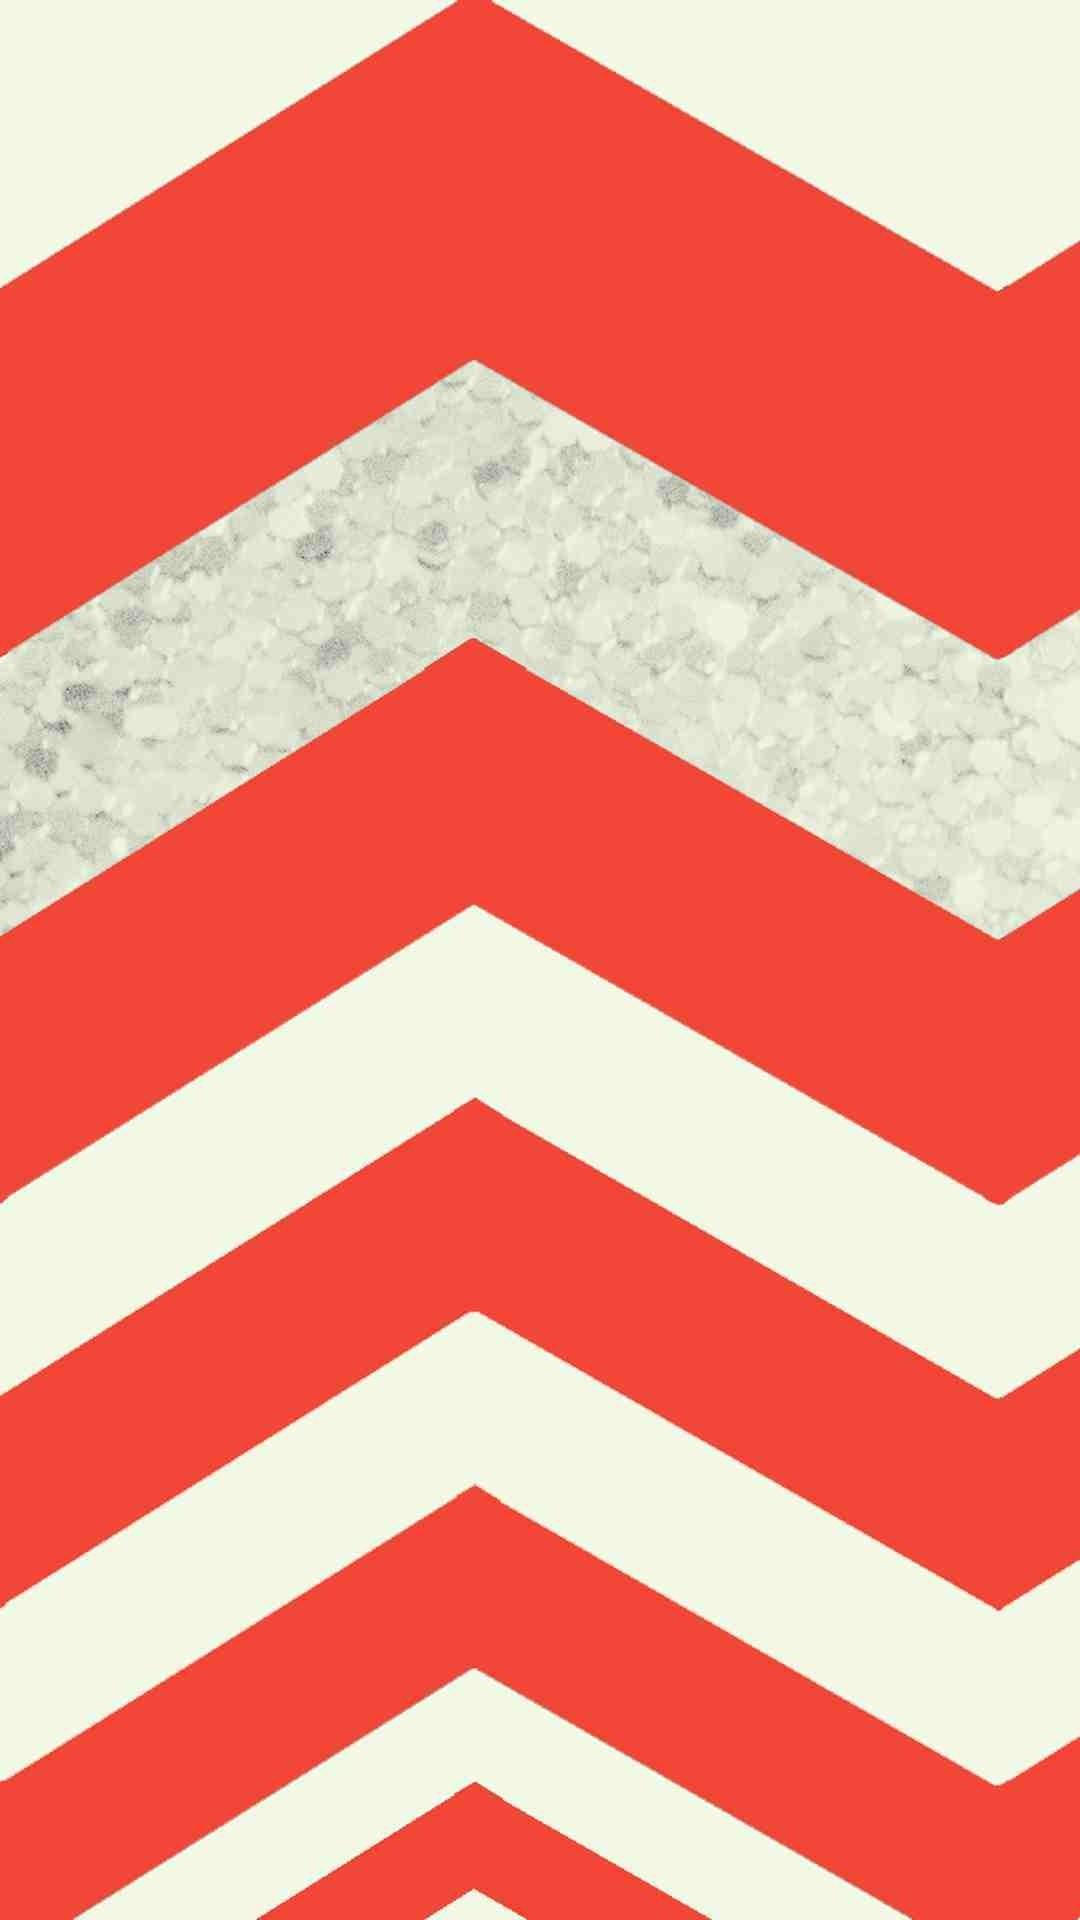 1080x1920 Huge Red Chevron Pattern IPhone 6 Plus Wallpaper